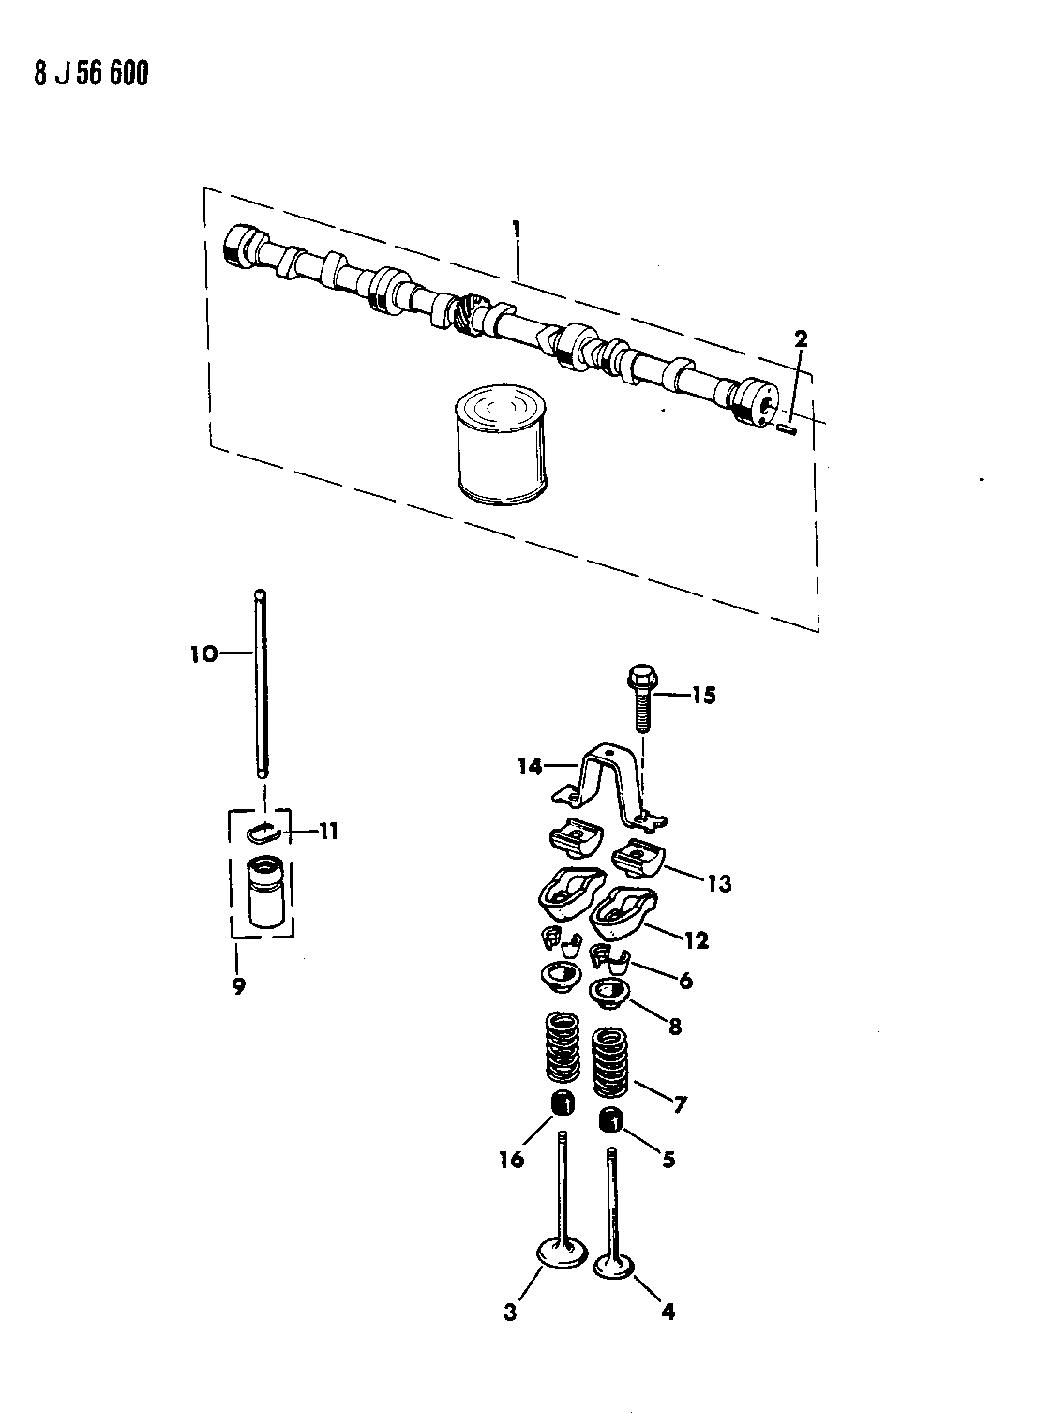 1989 Jeep Wrangler Camshaft Valves Mopar Parts Giant Engine Diagram Thumbnail 1